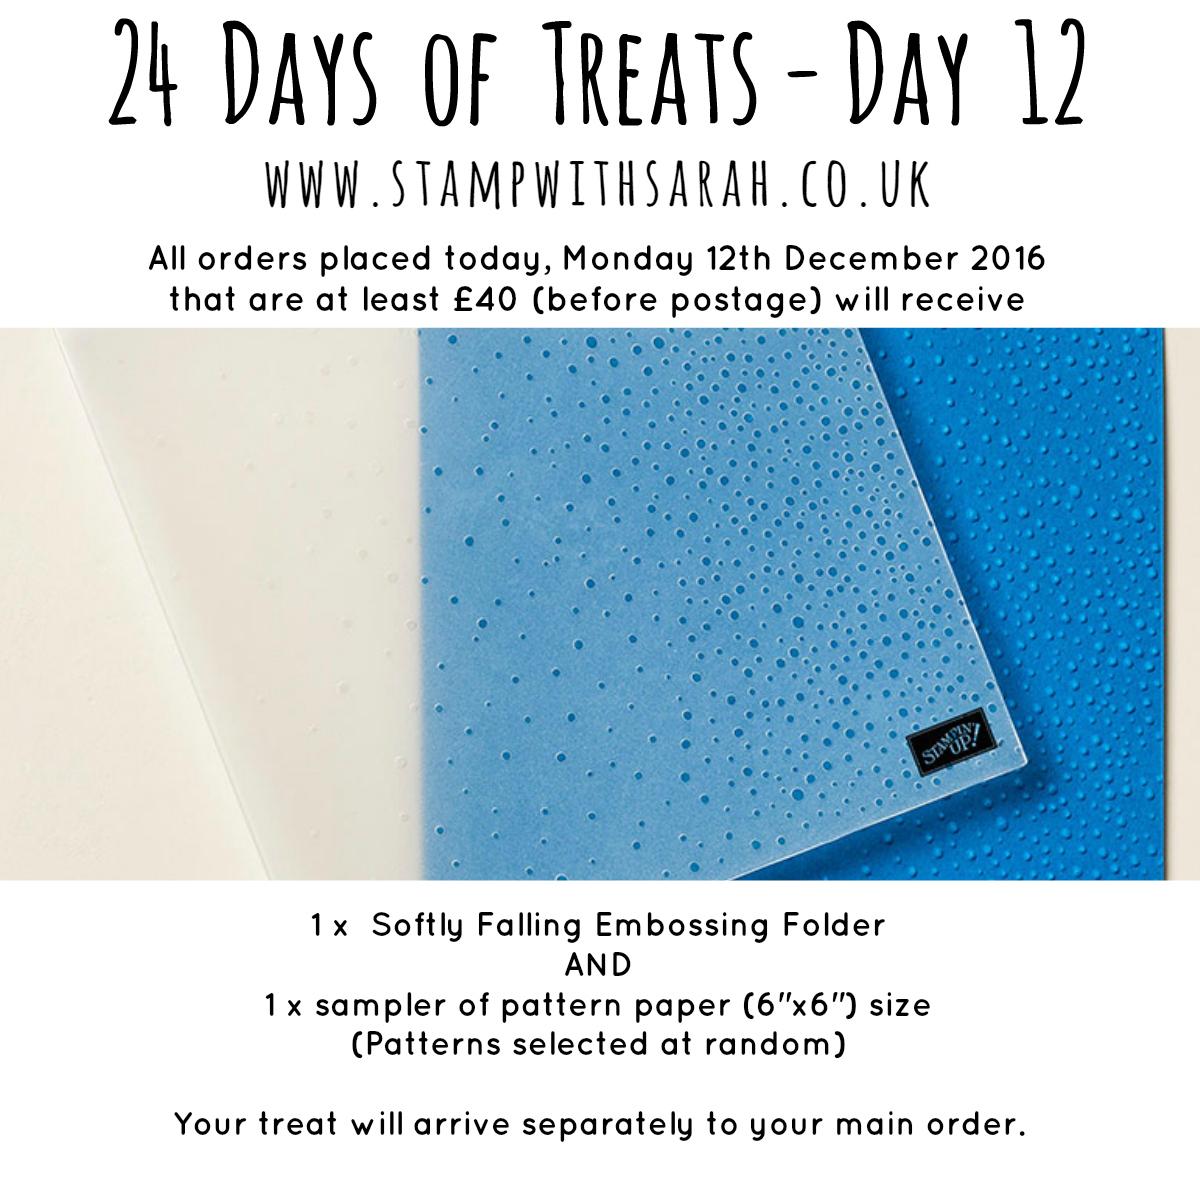 24-days-of-treats-day-12